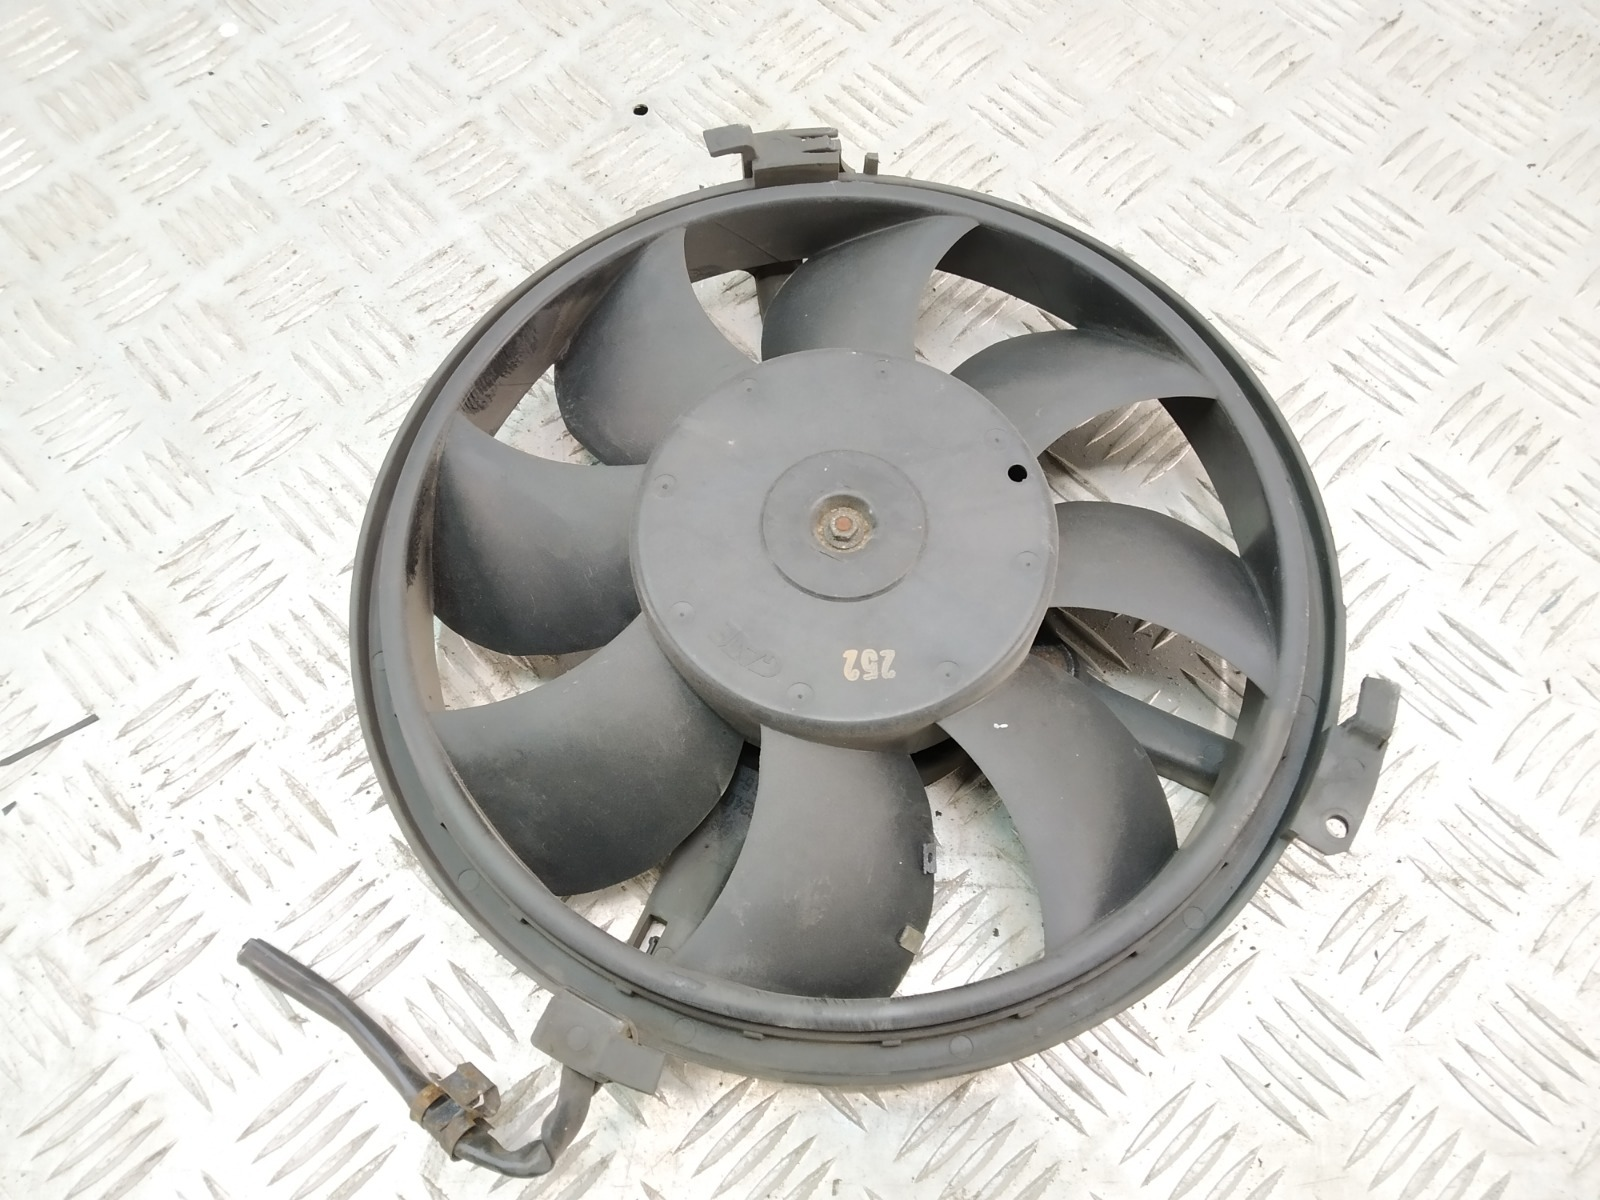 Вентилятор кондиционера Audi A6 C5 1.8 TI 2002 (б/у)